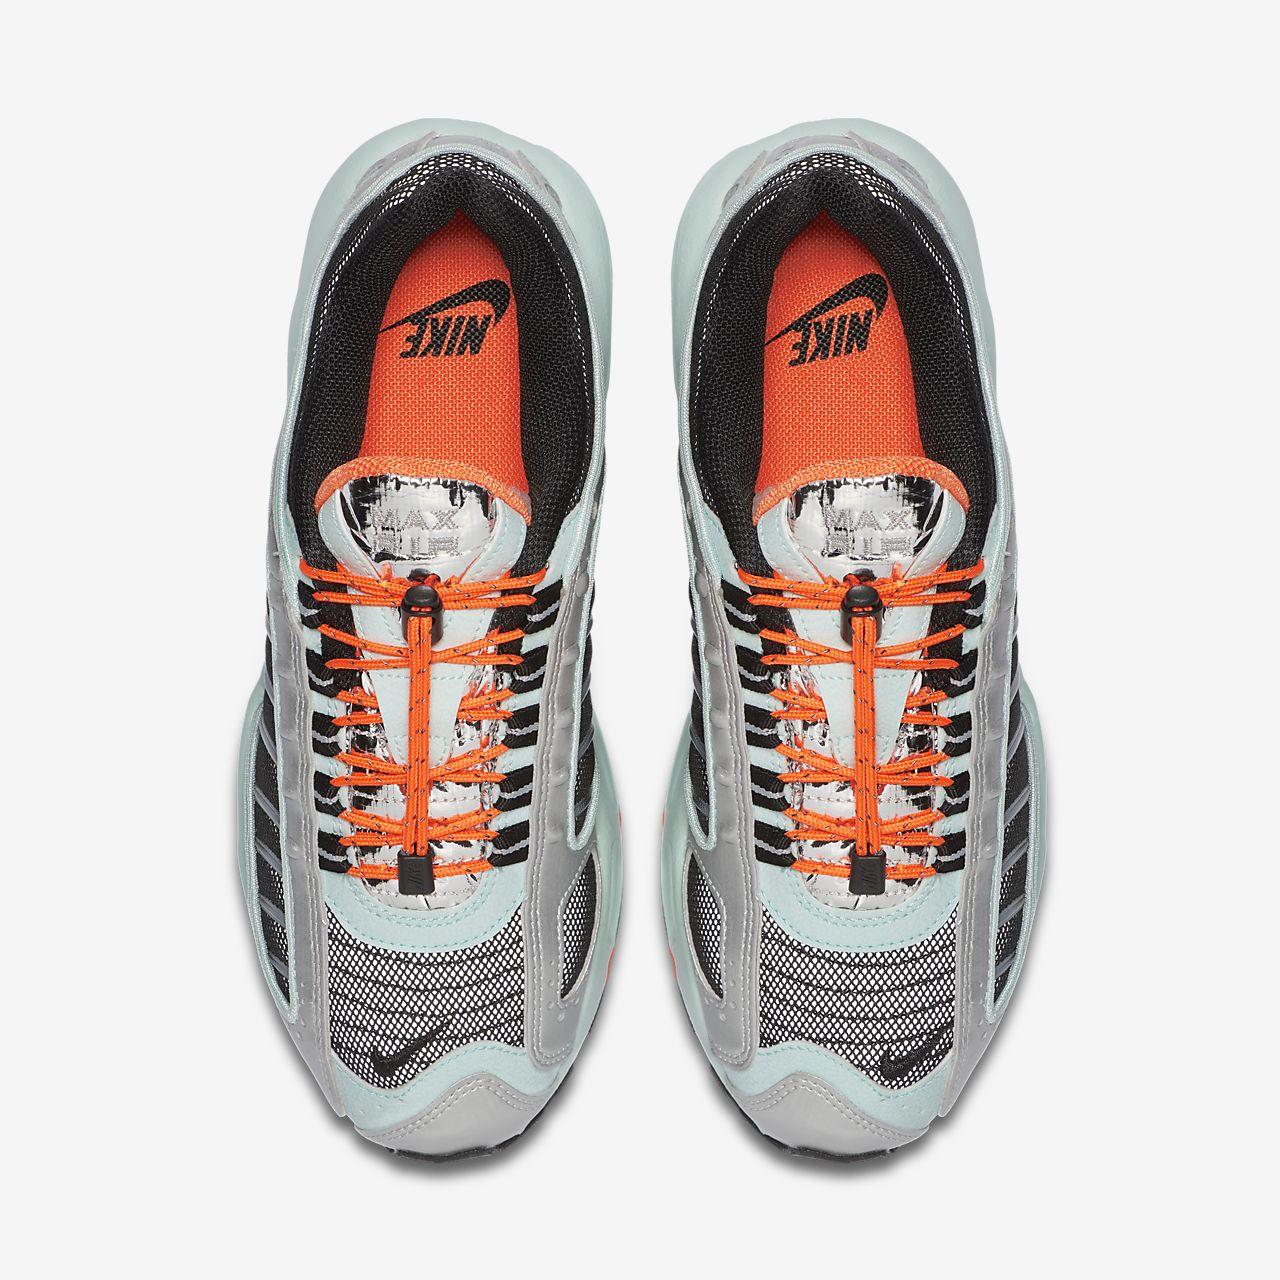 Nike Tailwind Max Damenschuh IV Air YEHI29WD